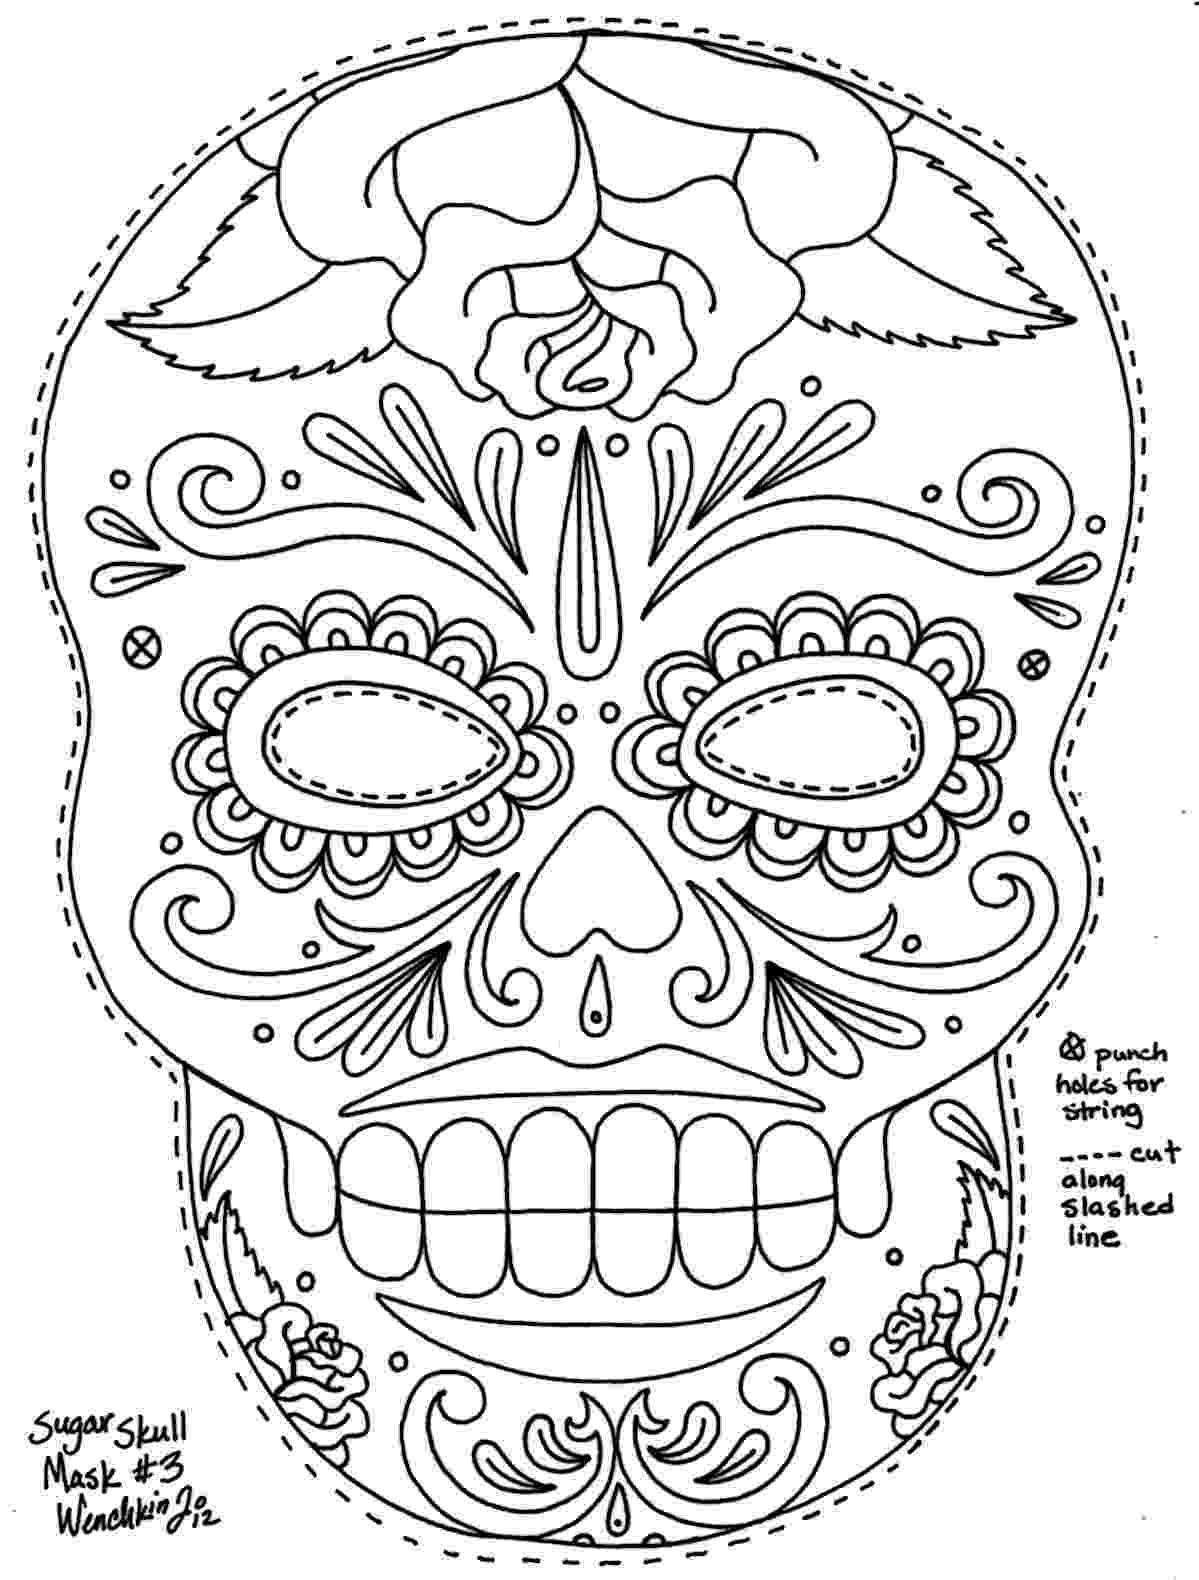 skull coloring sheet printable skulls coloring pages for kids cool2bkids sheet coloring skull